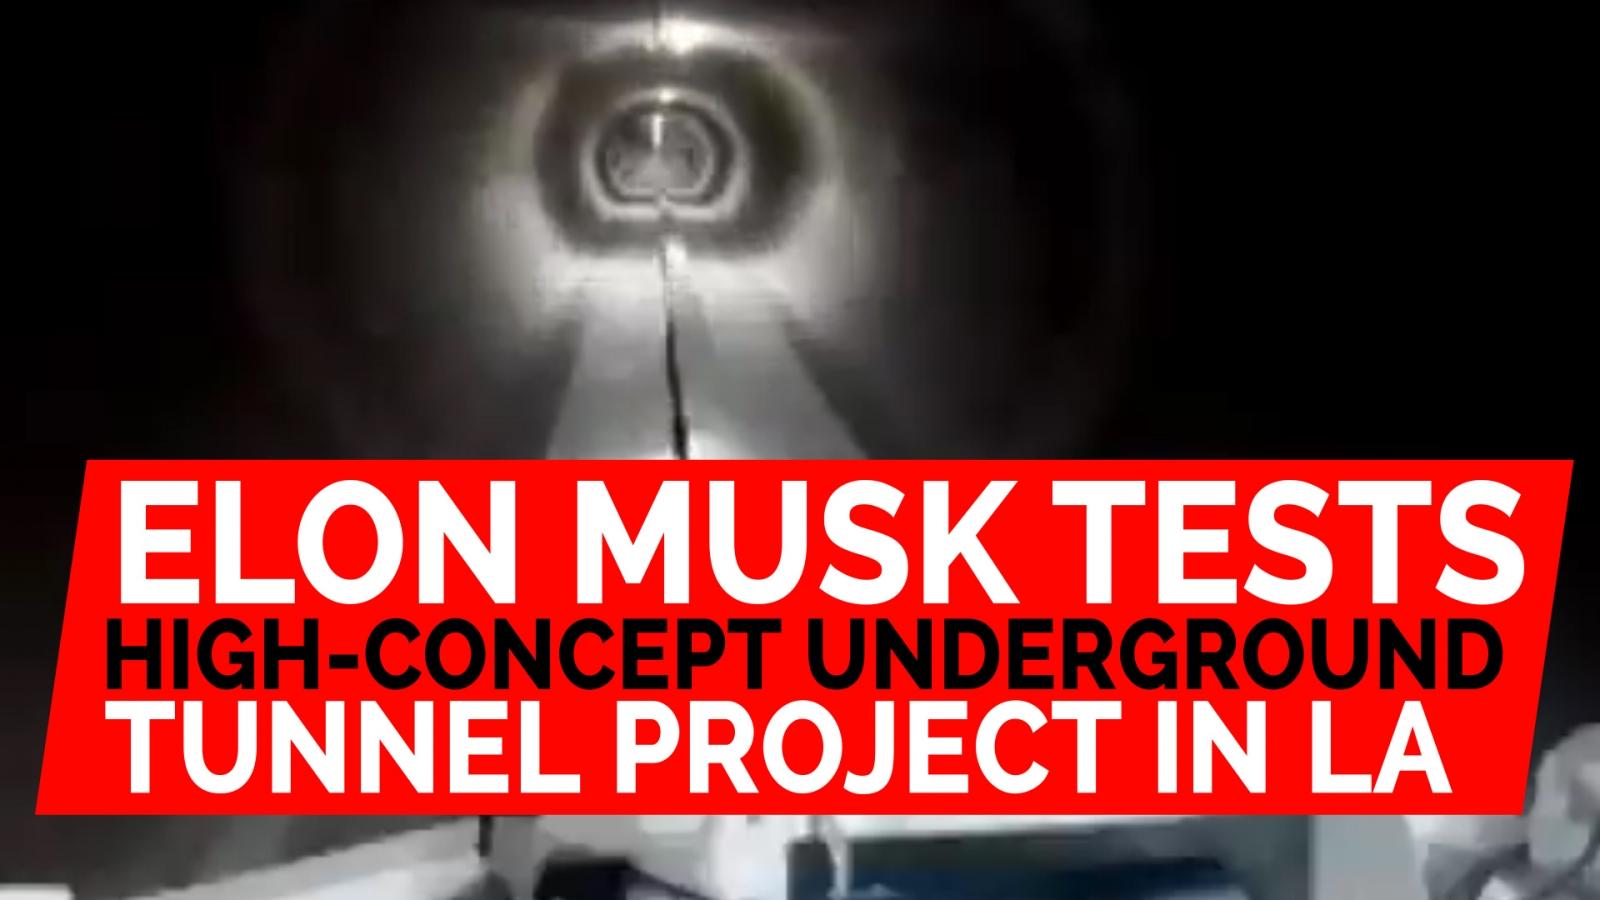 East Coast Diesel >> Nantucket to be powered by 48 megawatt-hour Tesla battery